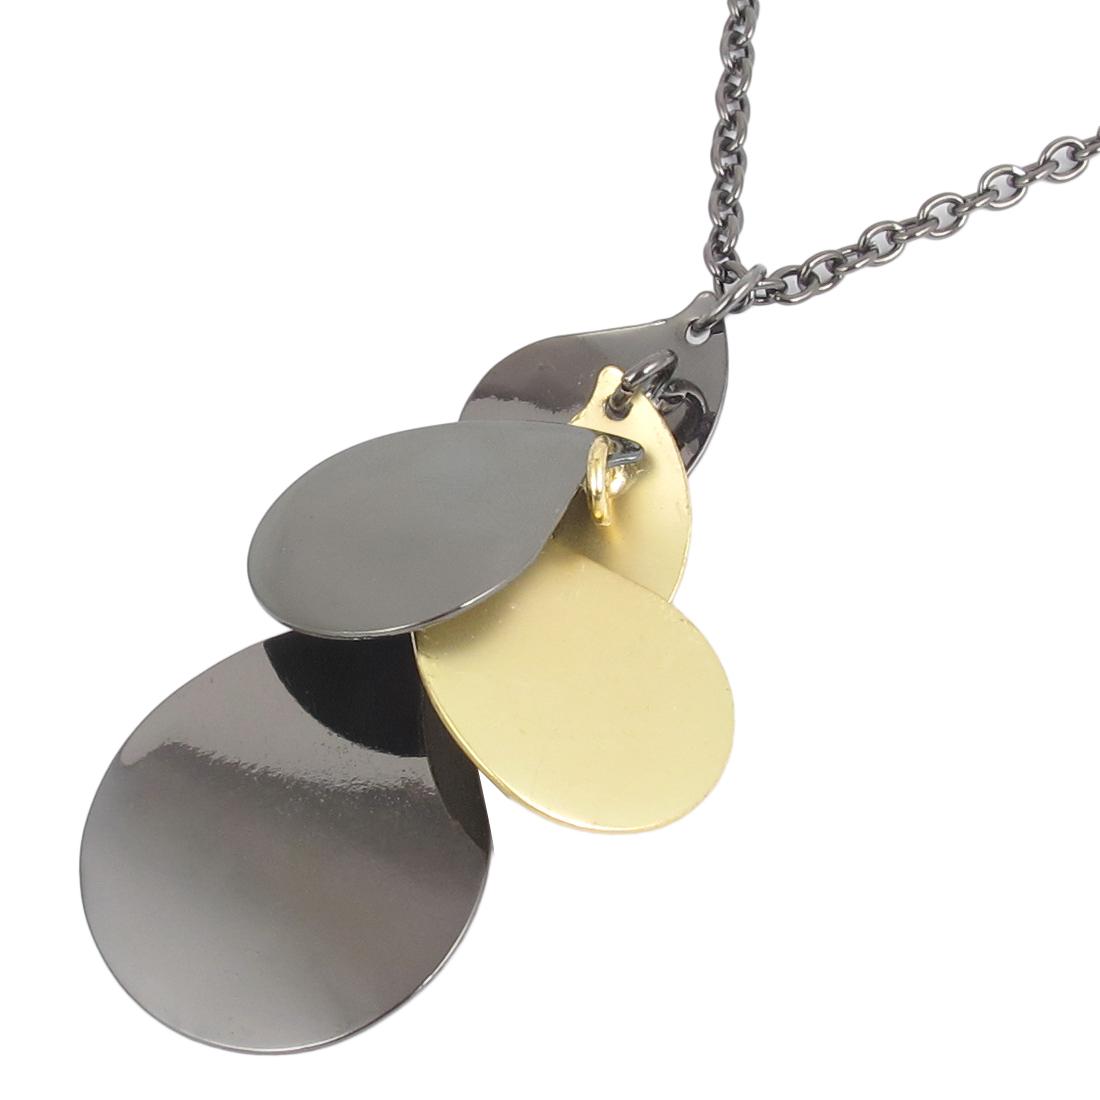 Yellow Black Metal Waterdrop Shape Pendants Lobster Buckle Strip Link Chain Necklace Neckwear Collar for Ladies Women